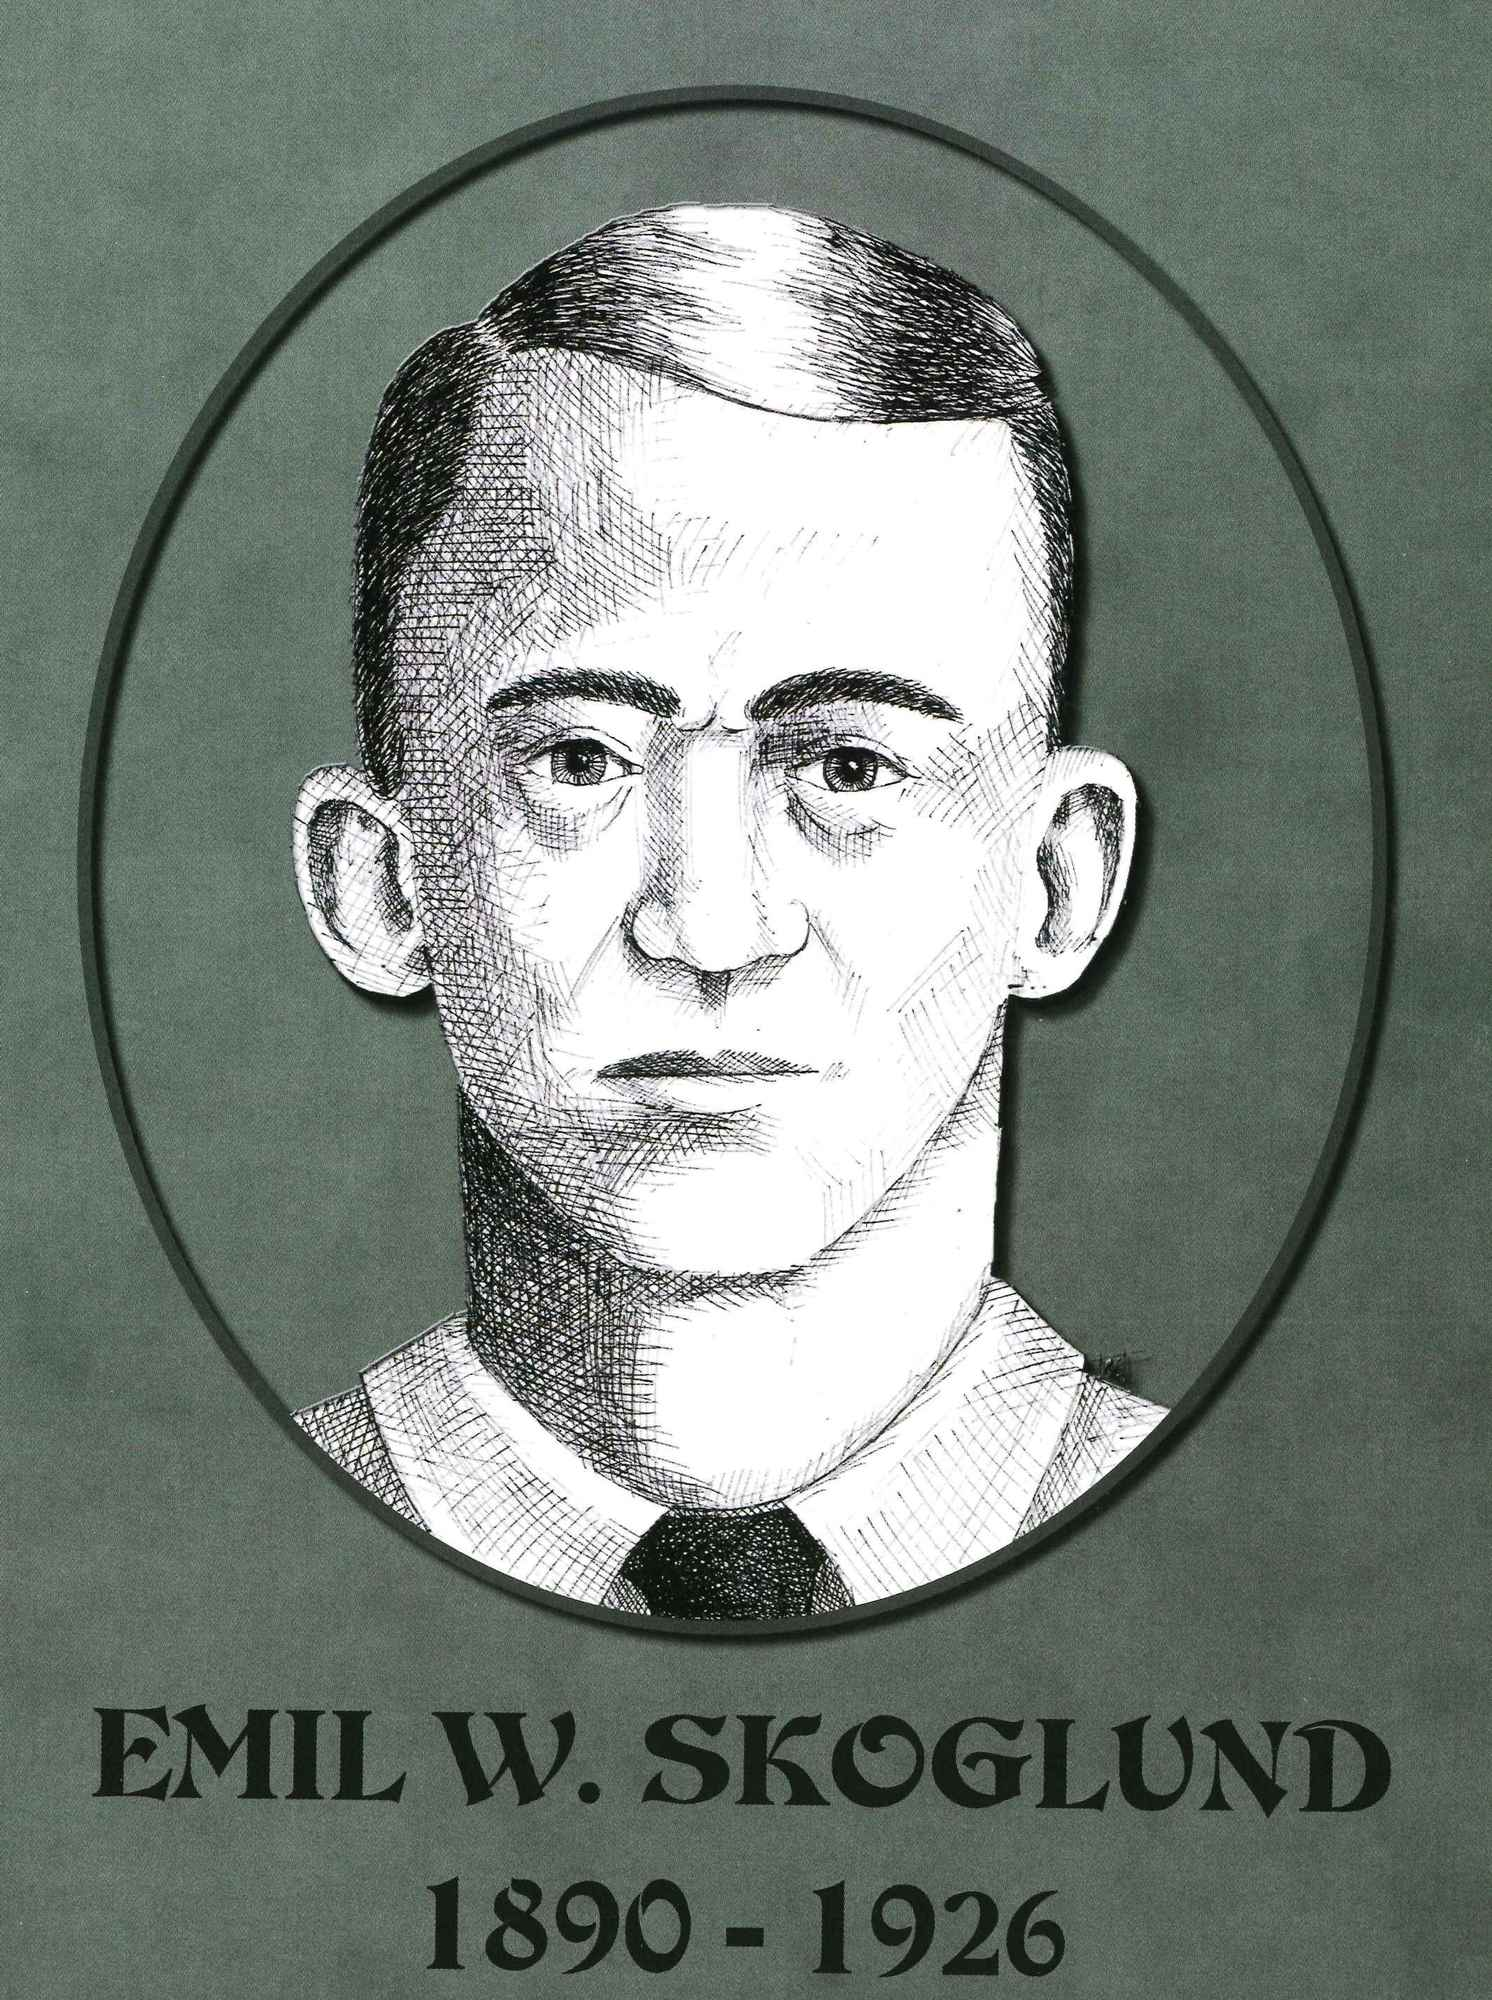 Sketch of Emil Skoglund, killed in 1926.